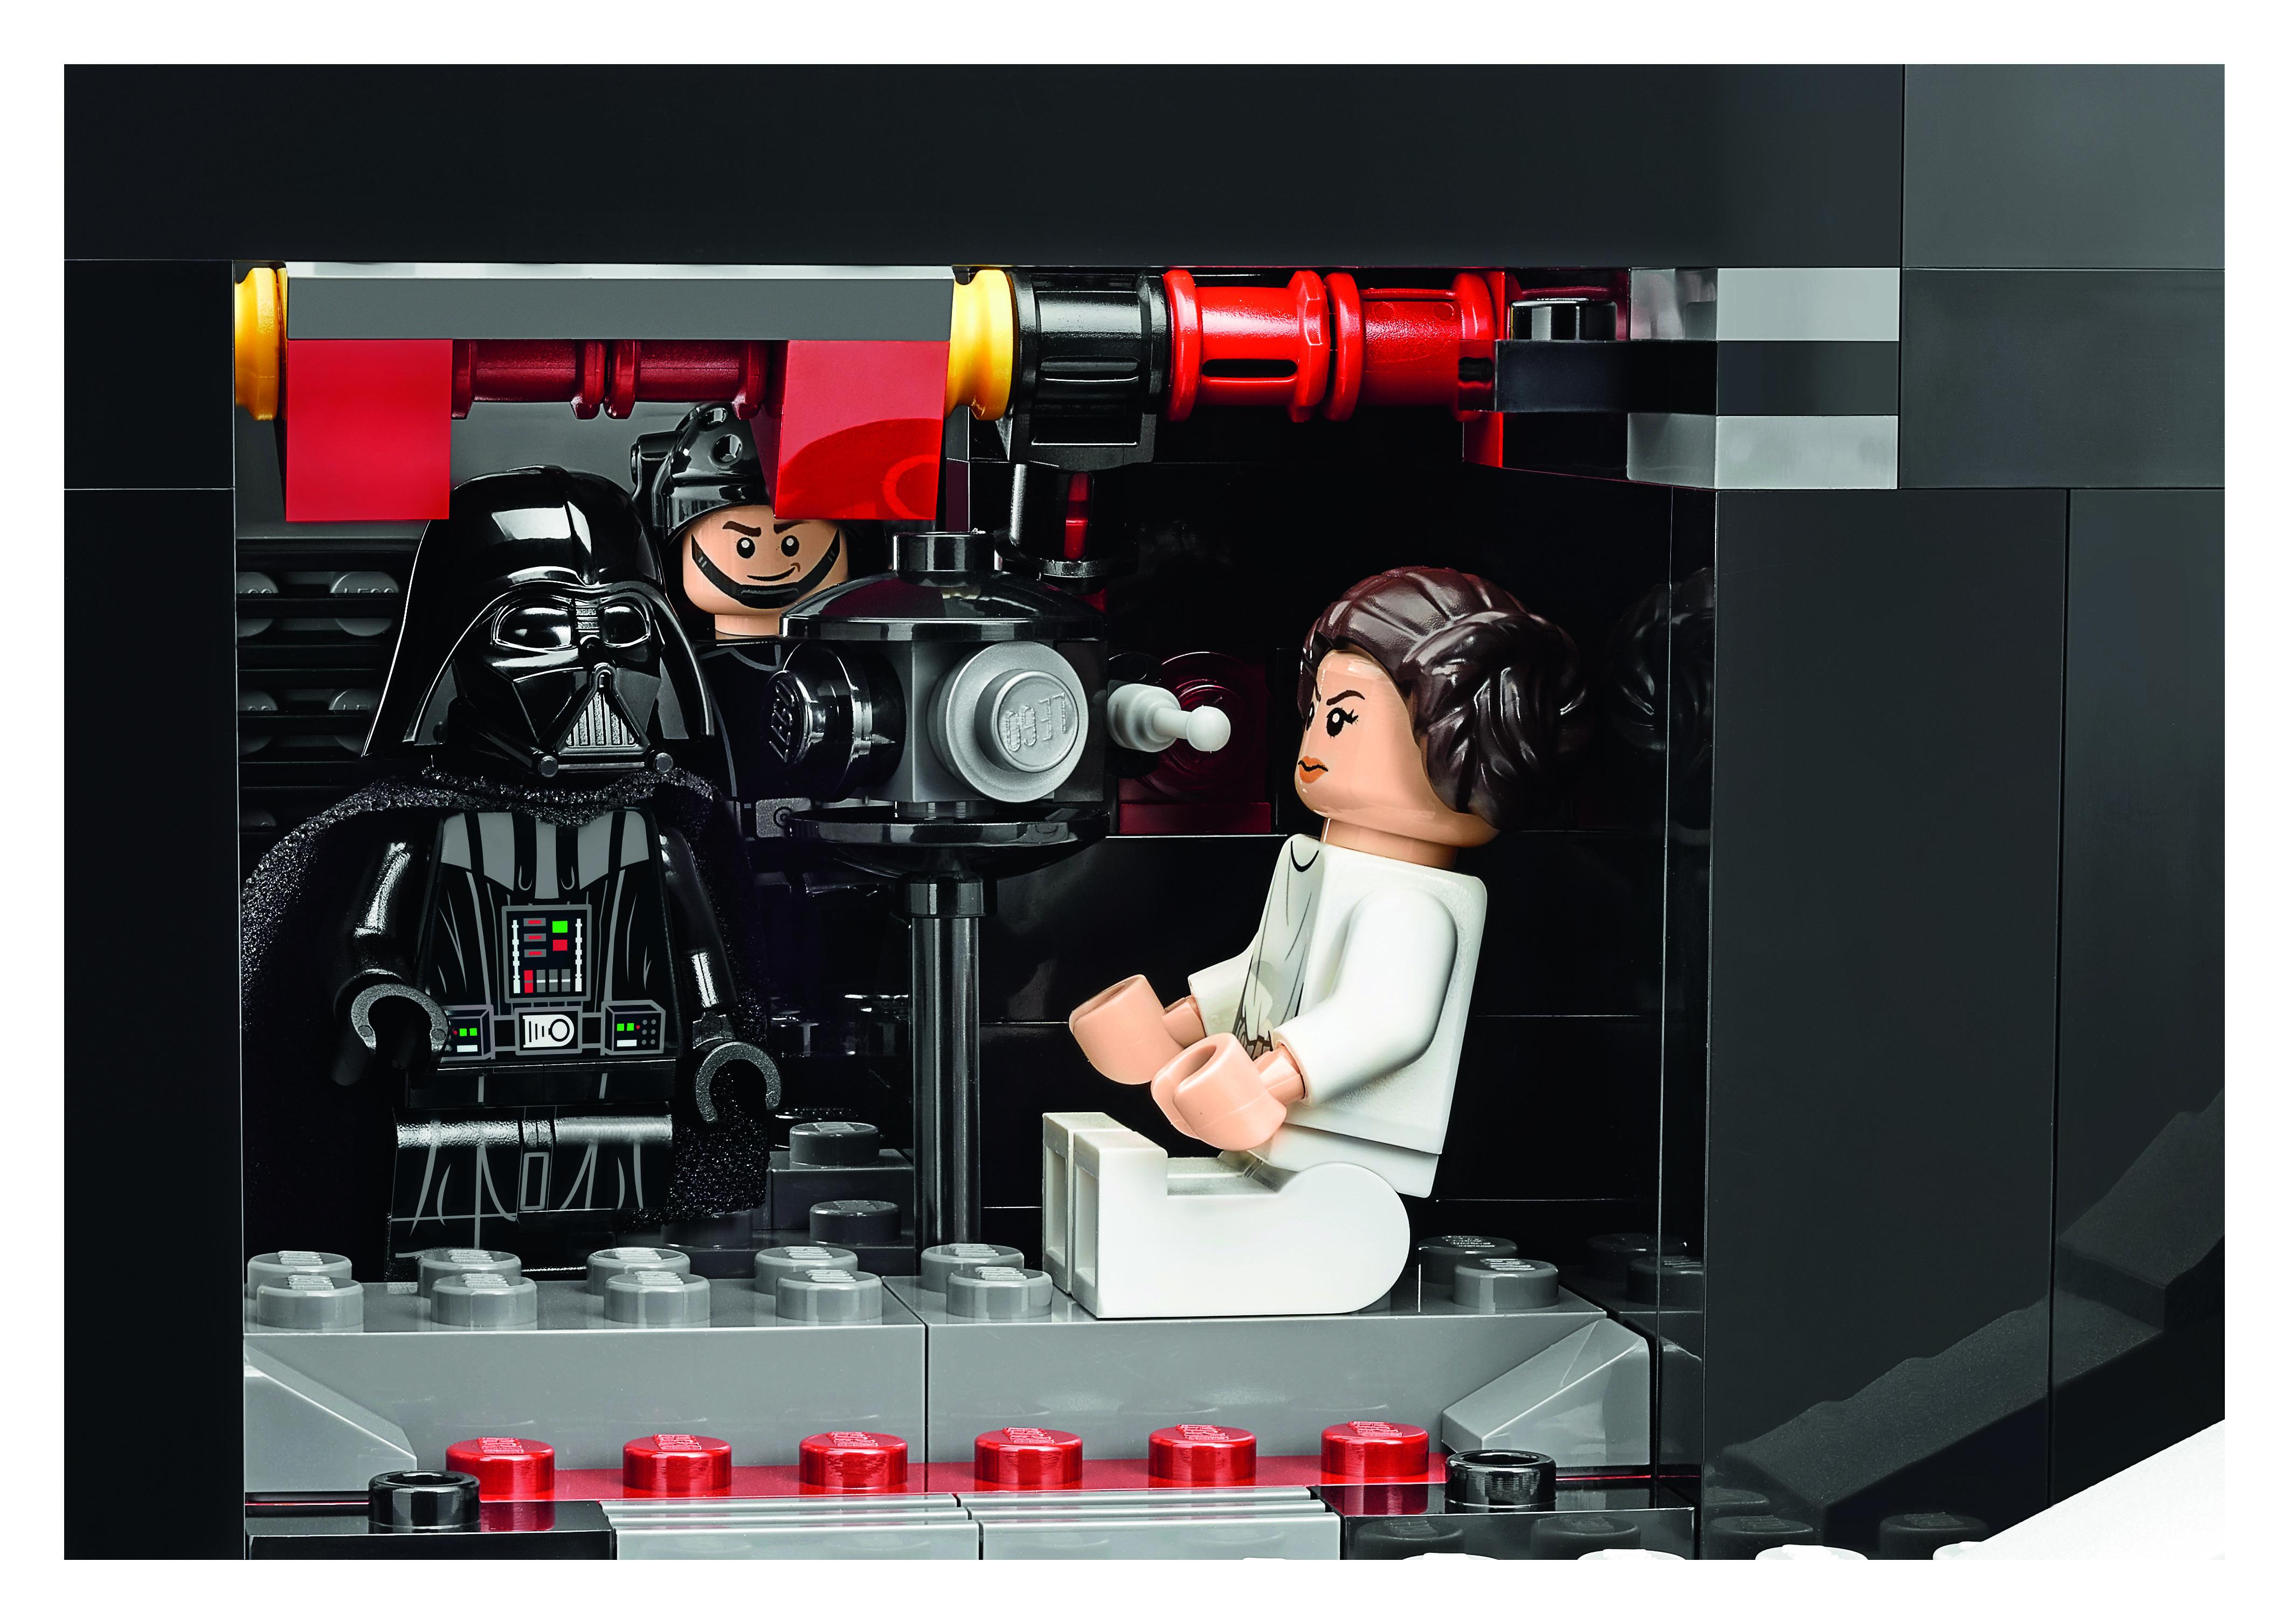 Lego Star Wars Ucs Death Star 75159 9 The Brick Fan